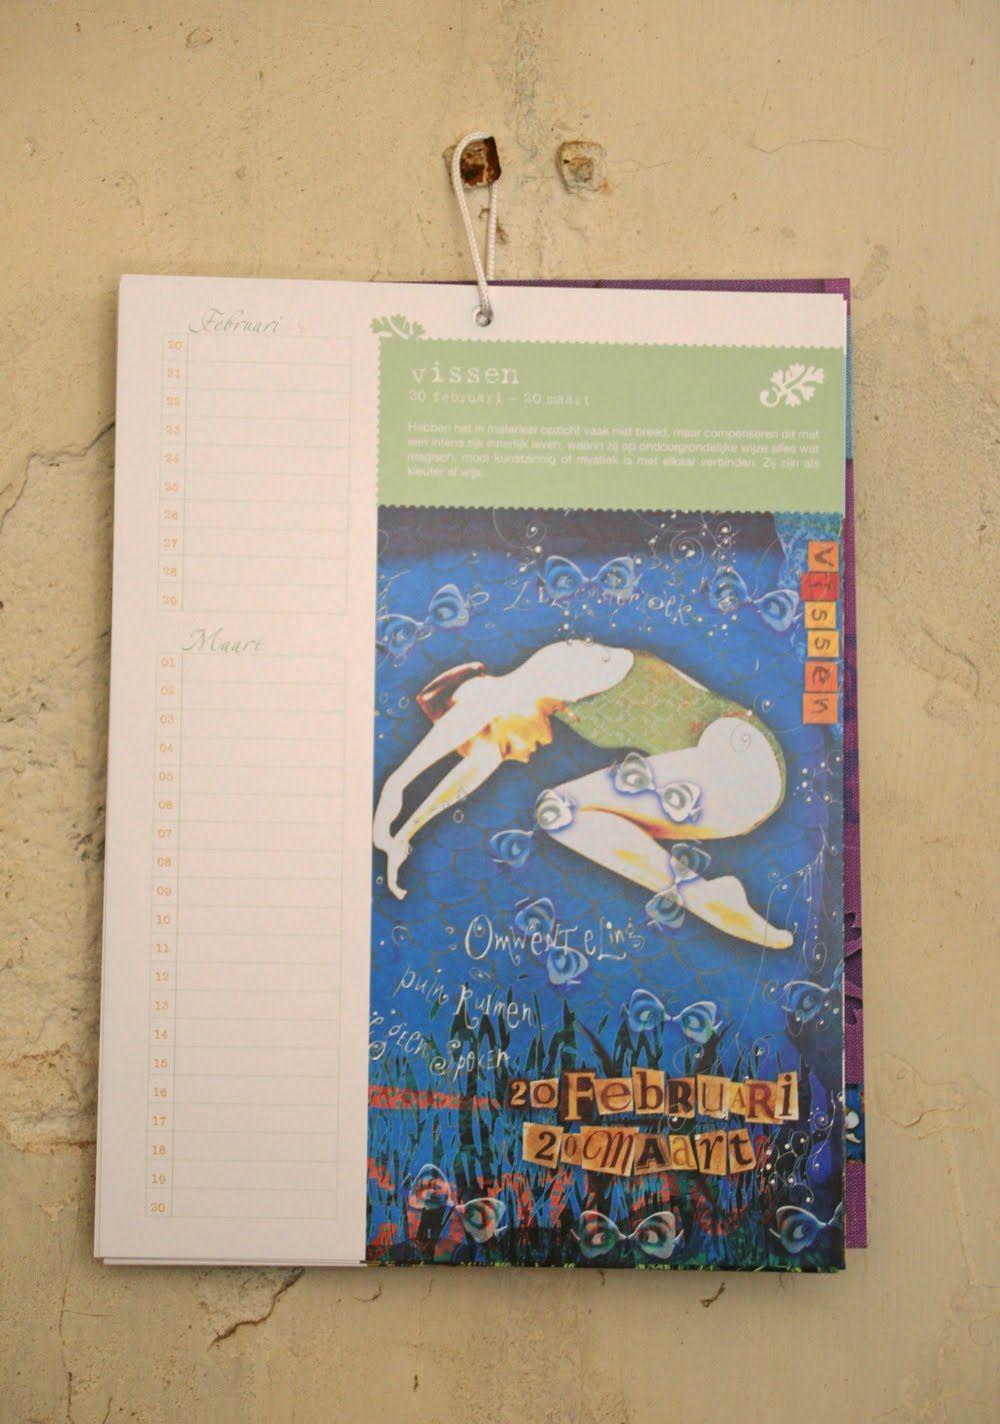 For Happinez birthday calendar